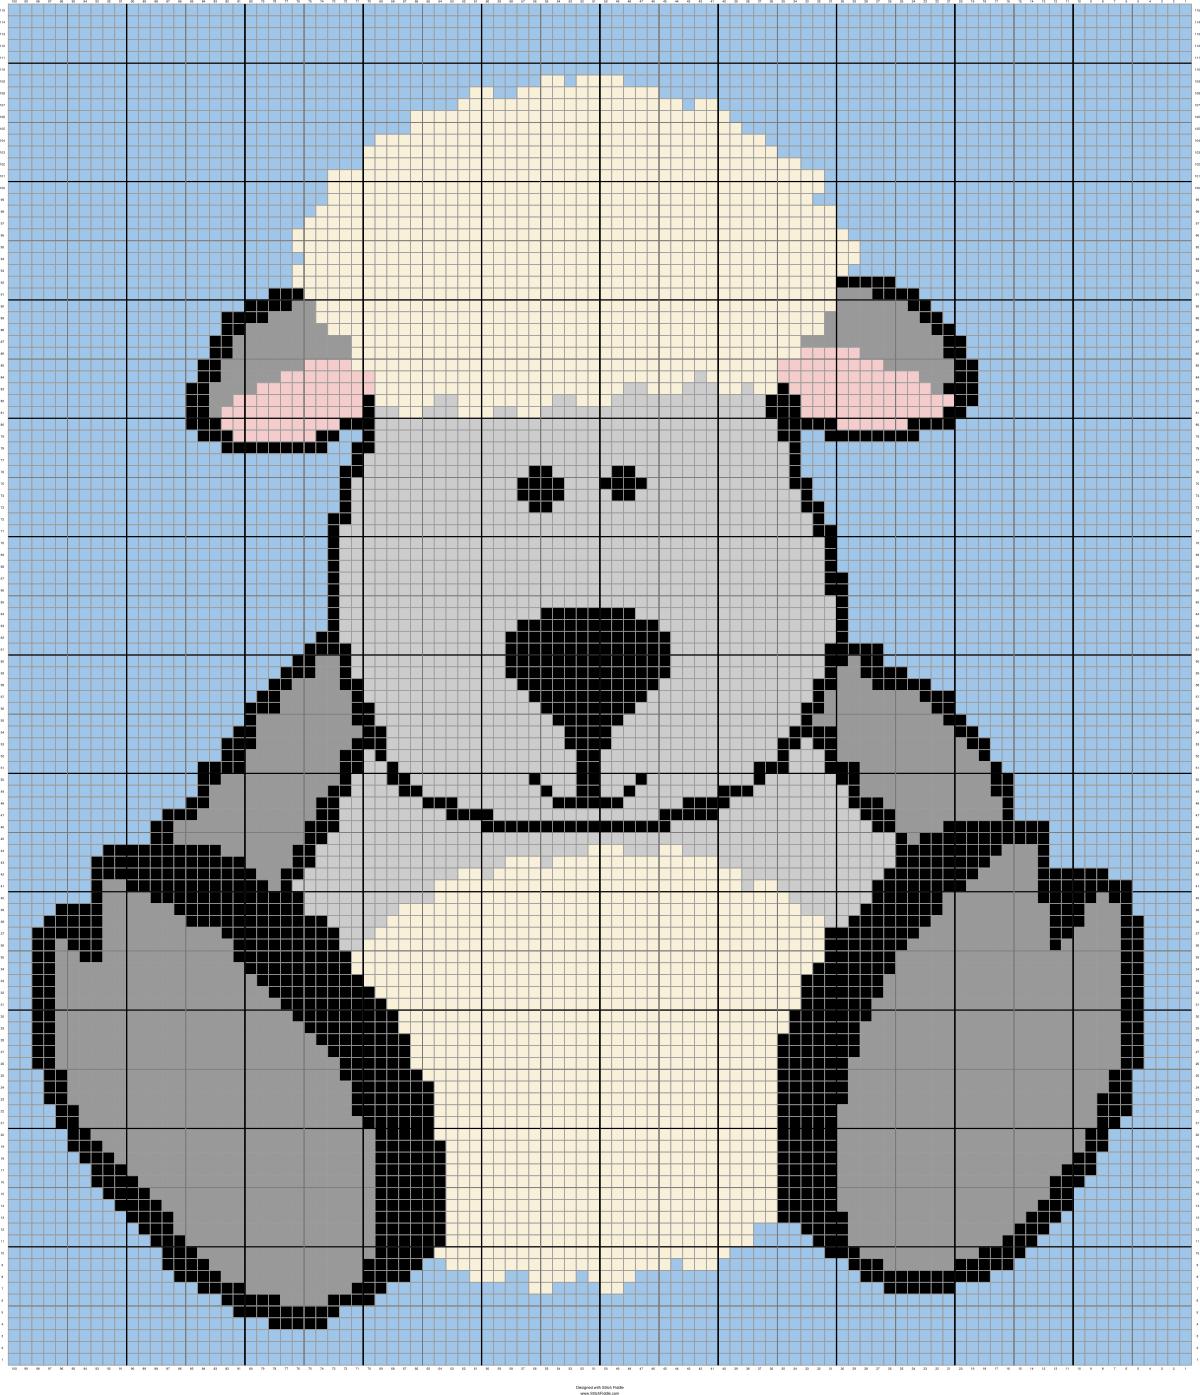 C2C Lamb - Jilly\'s Crochet Graphs | C2C Crochet and Graphgan | Pinterest